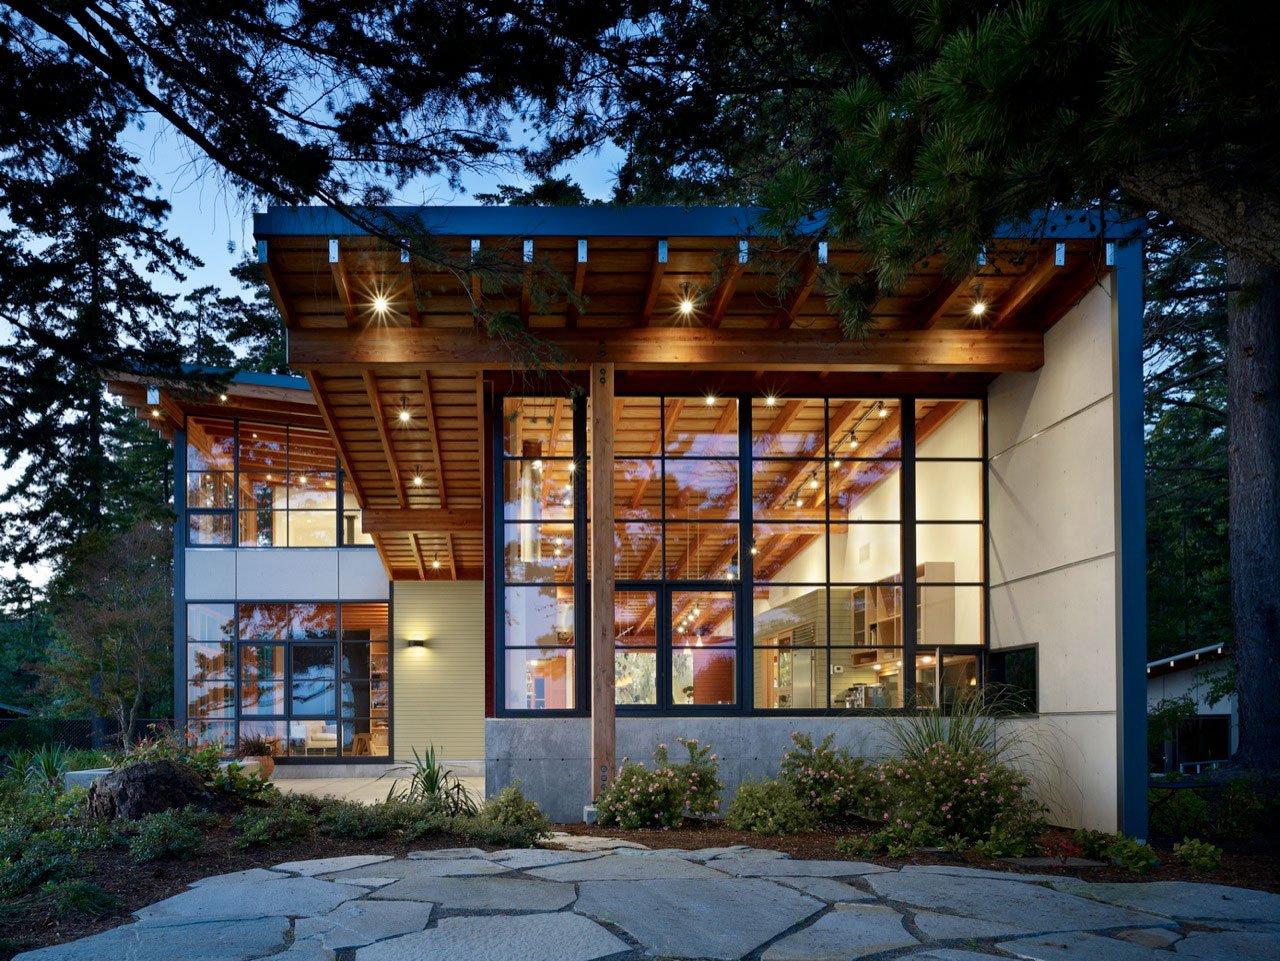 The Davis Residence by Miller Hull Partnership